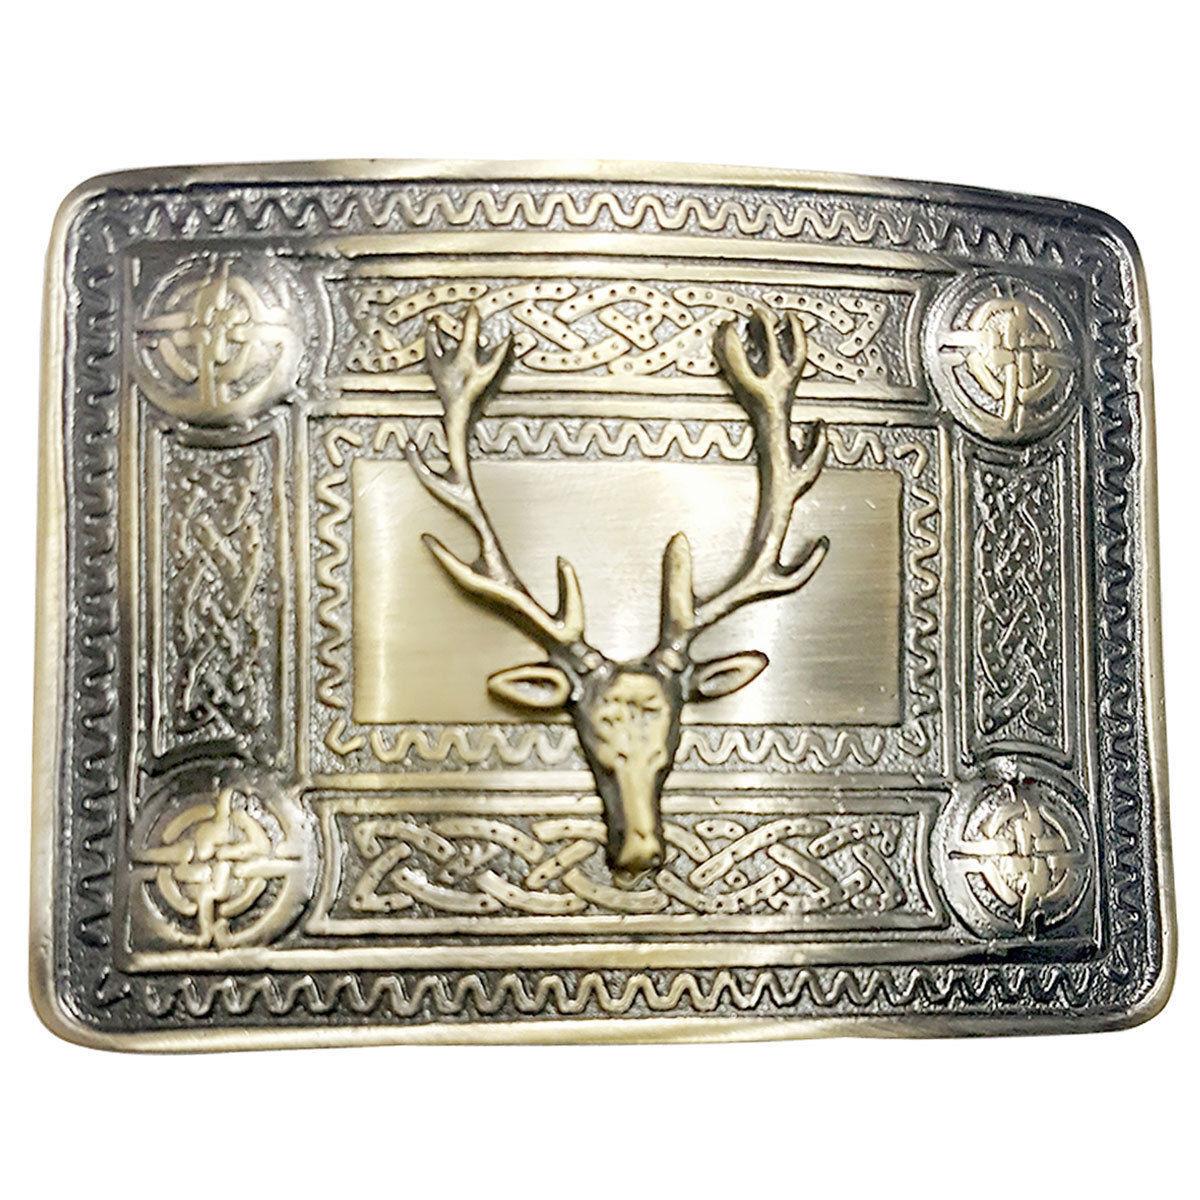 TE Scottish Kilt Belt Buckle Stag Head Celtic Knot 4 Demo Buckles Antique Finish